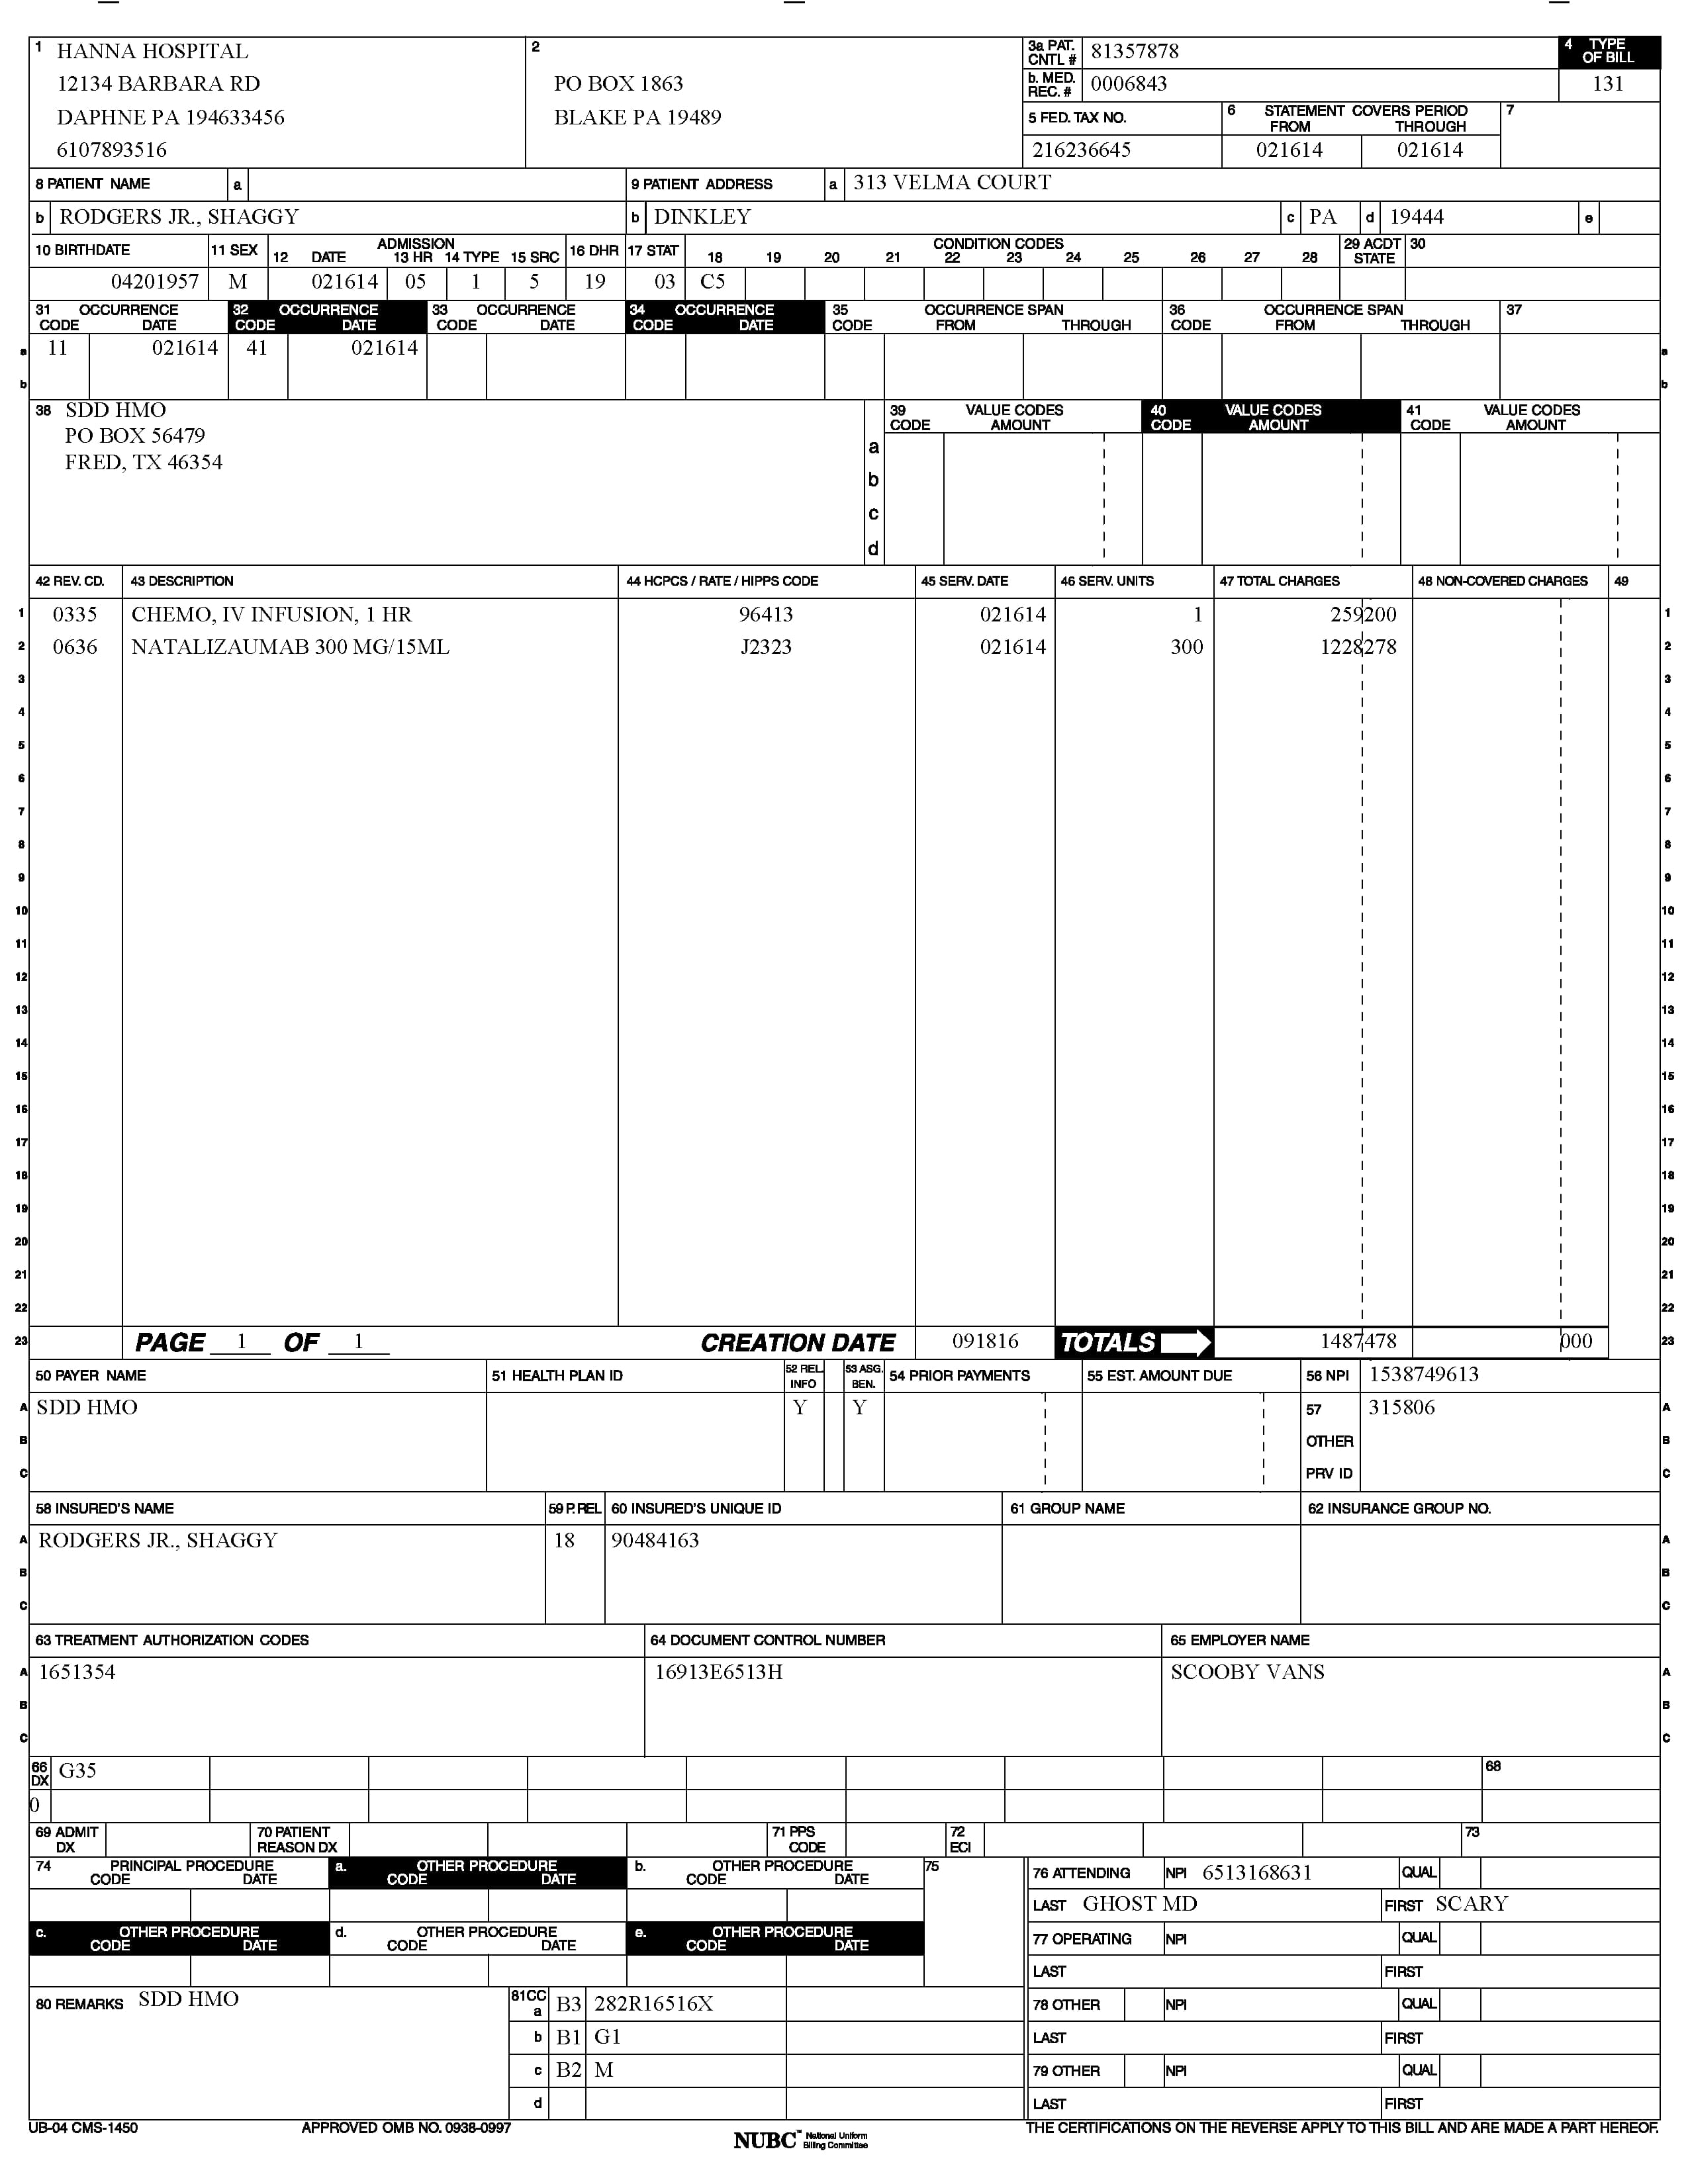 Processing Ub 04 Forms